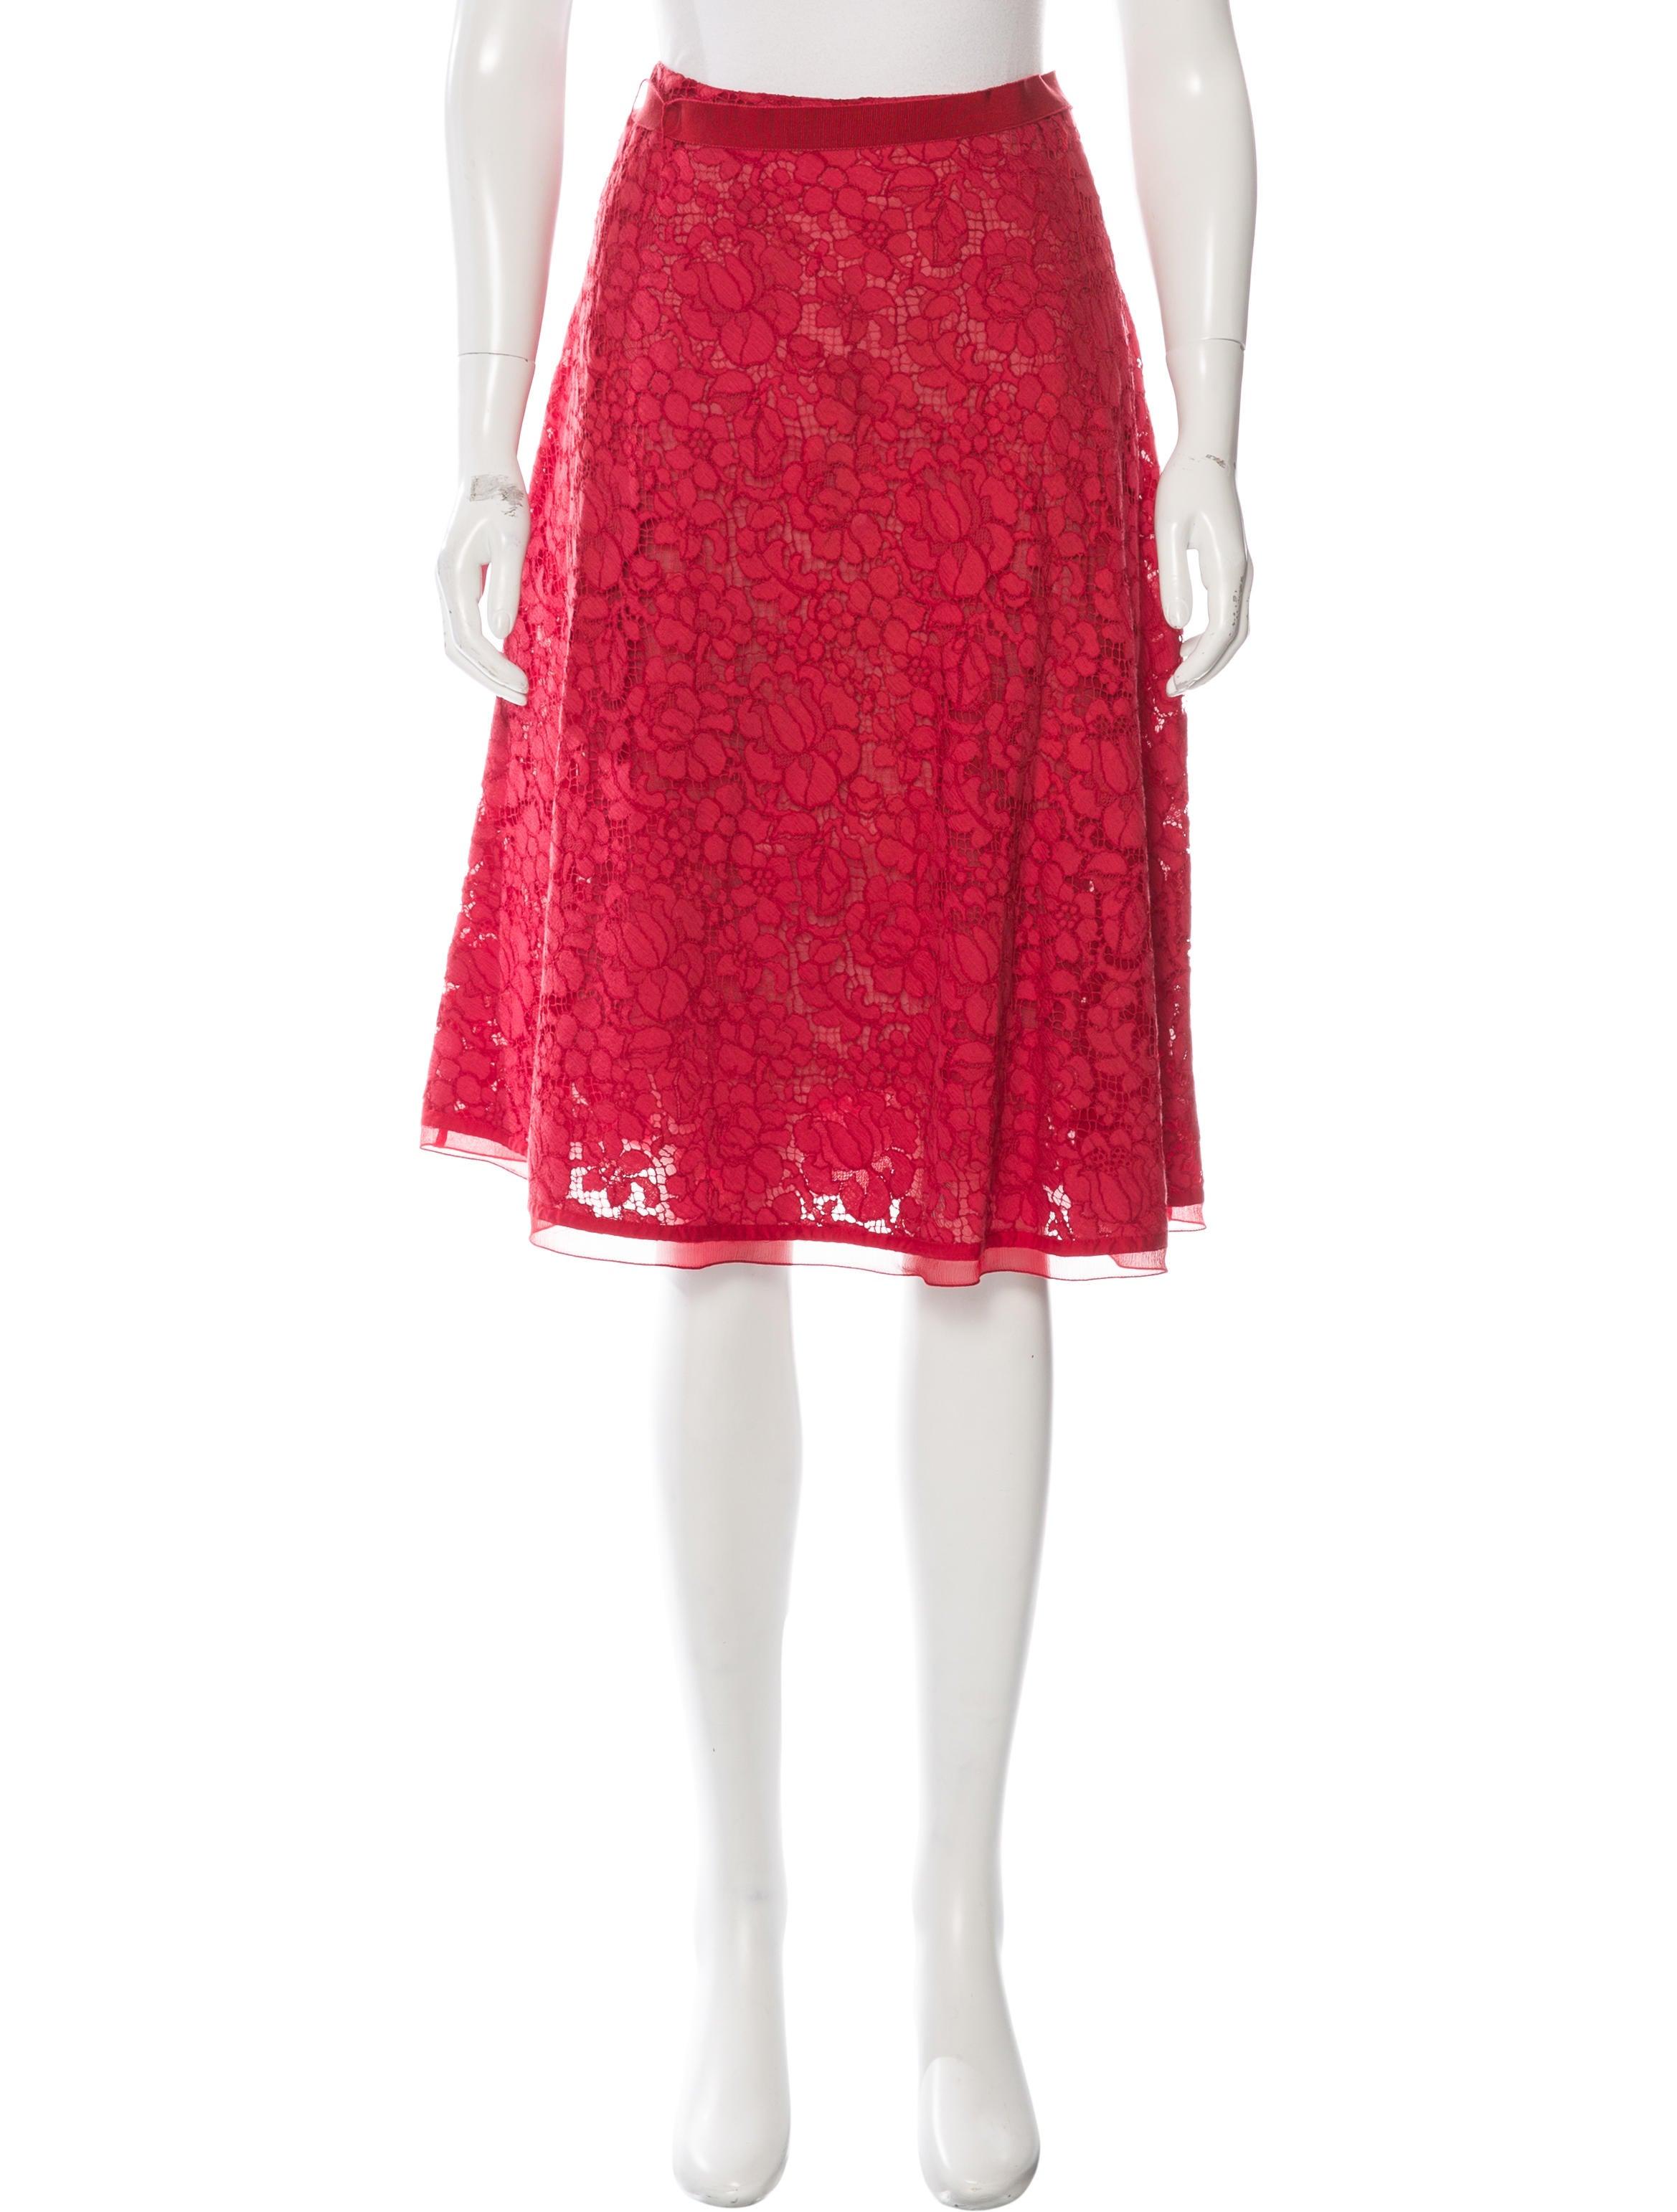 prada lace a line skirt clothing pra134449 the realreal